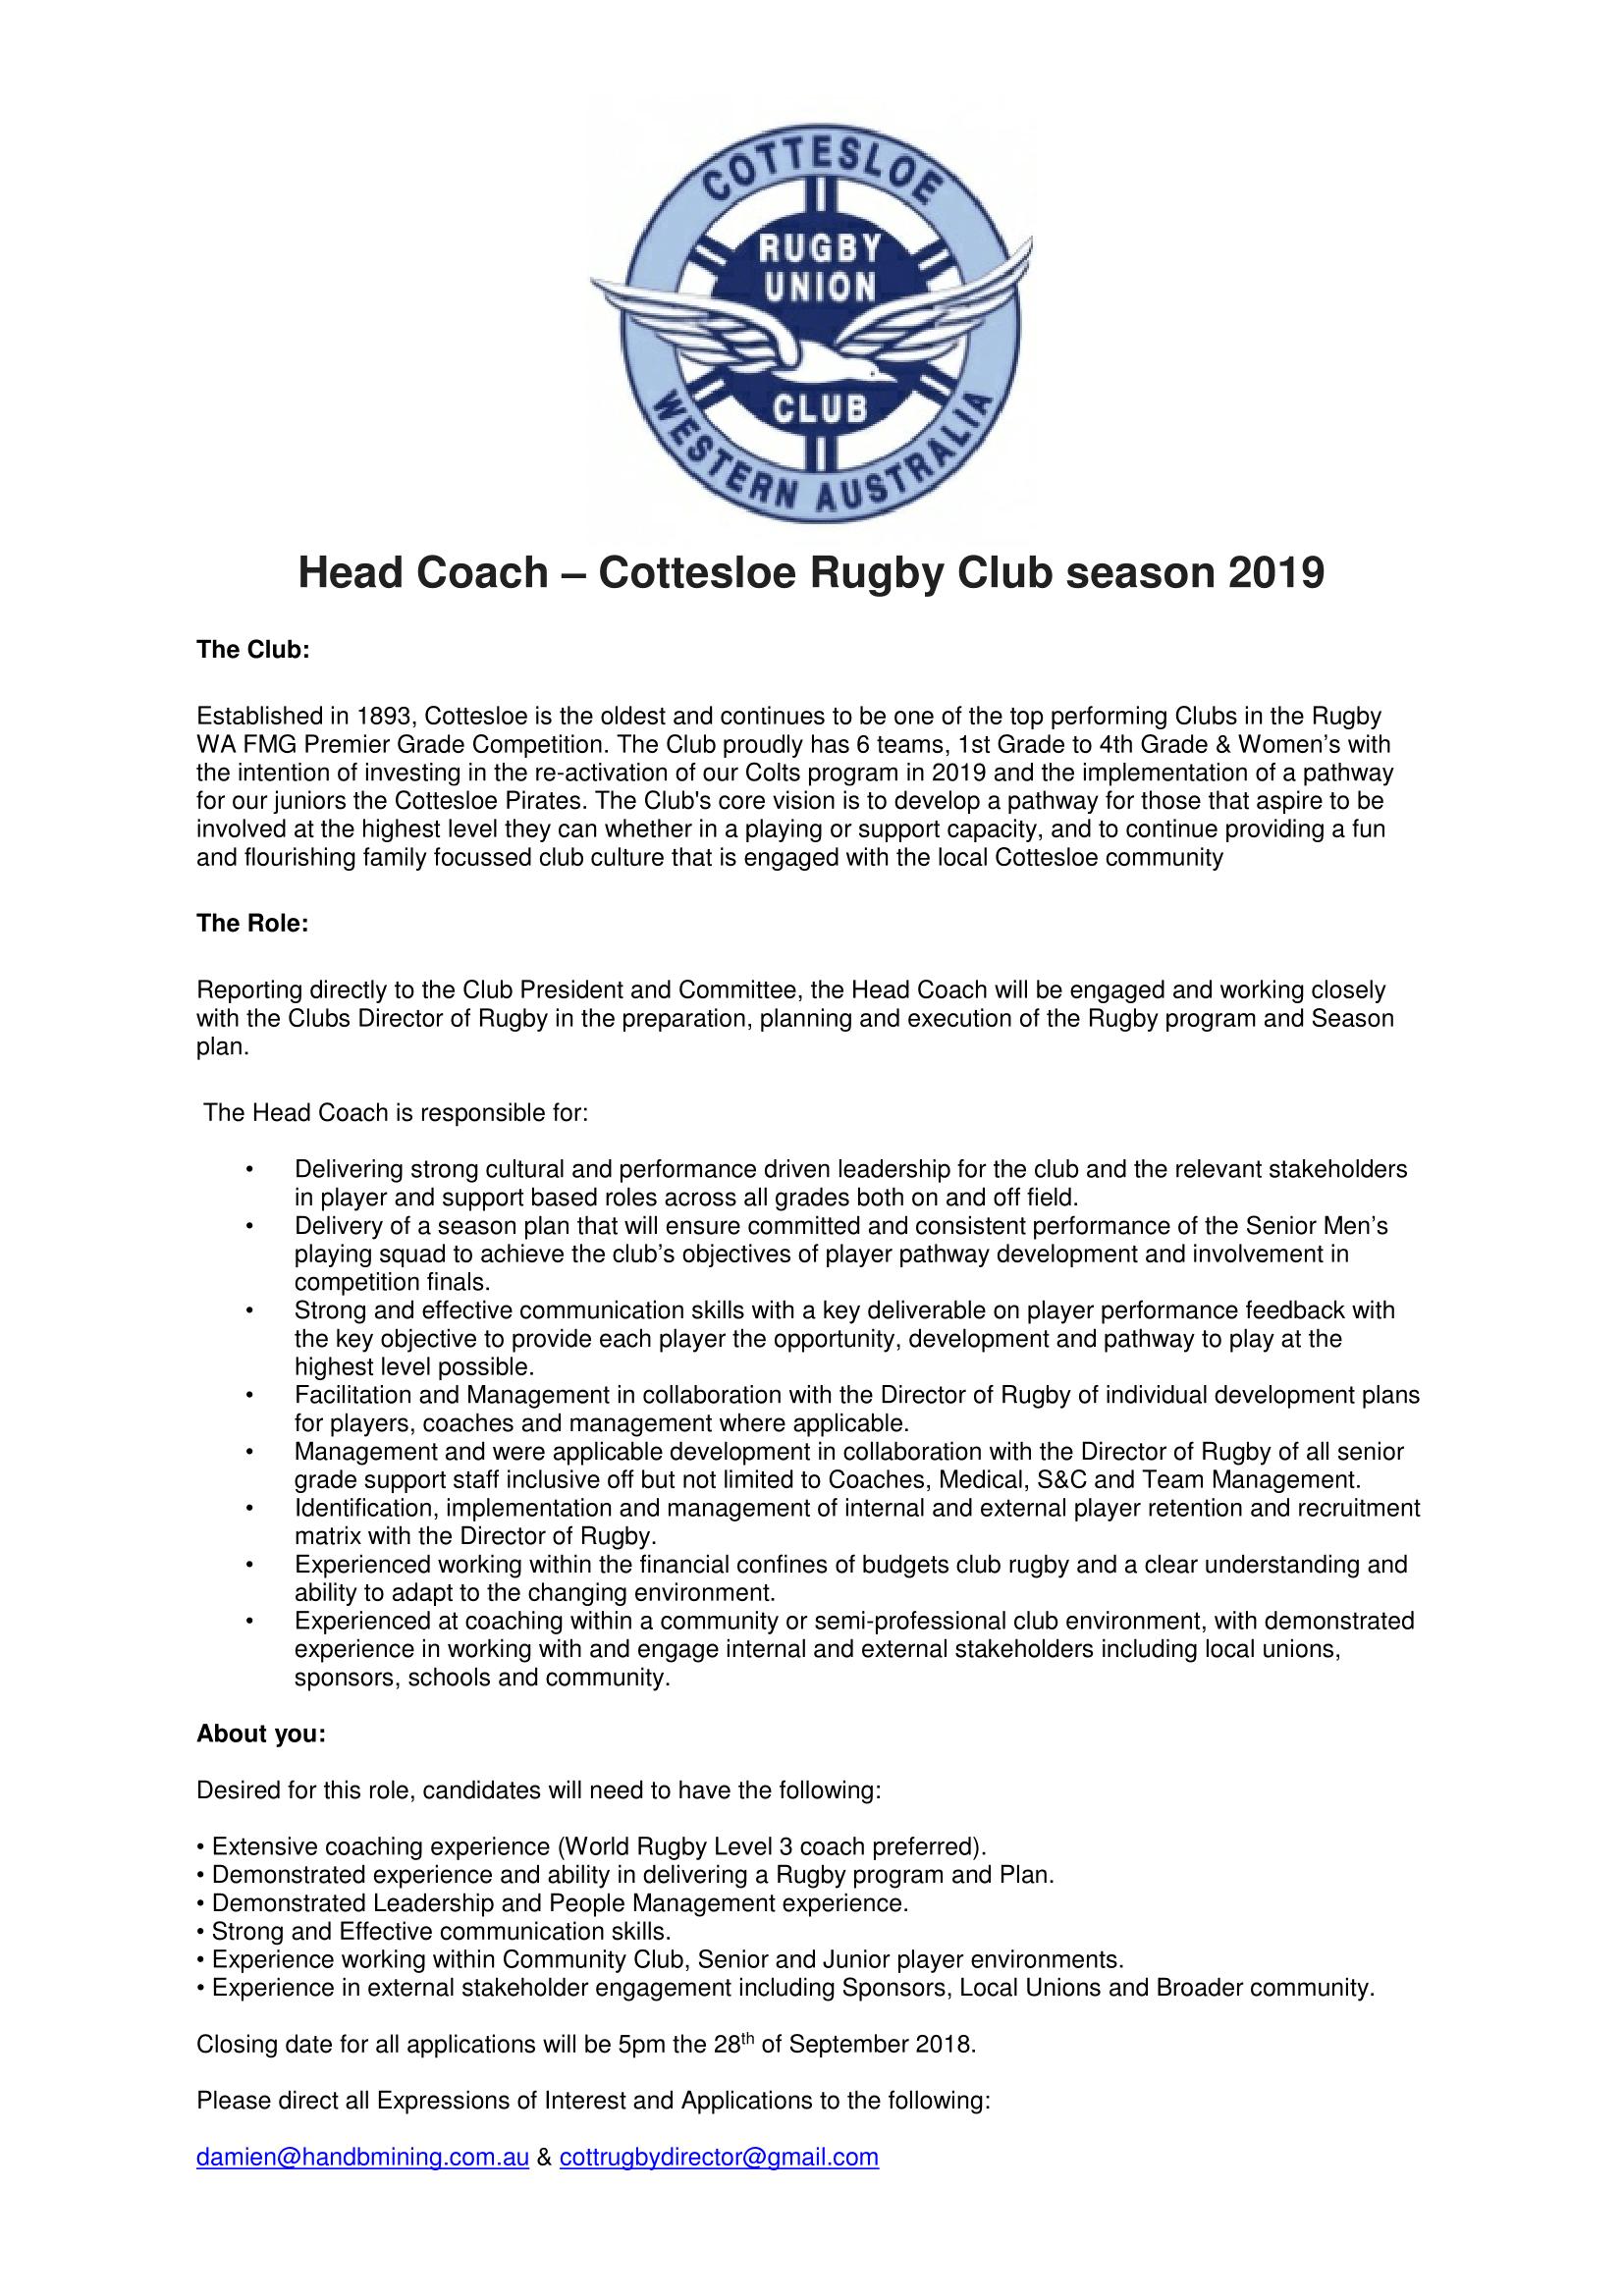 Cott Head Coach 2019 season-1.png